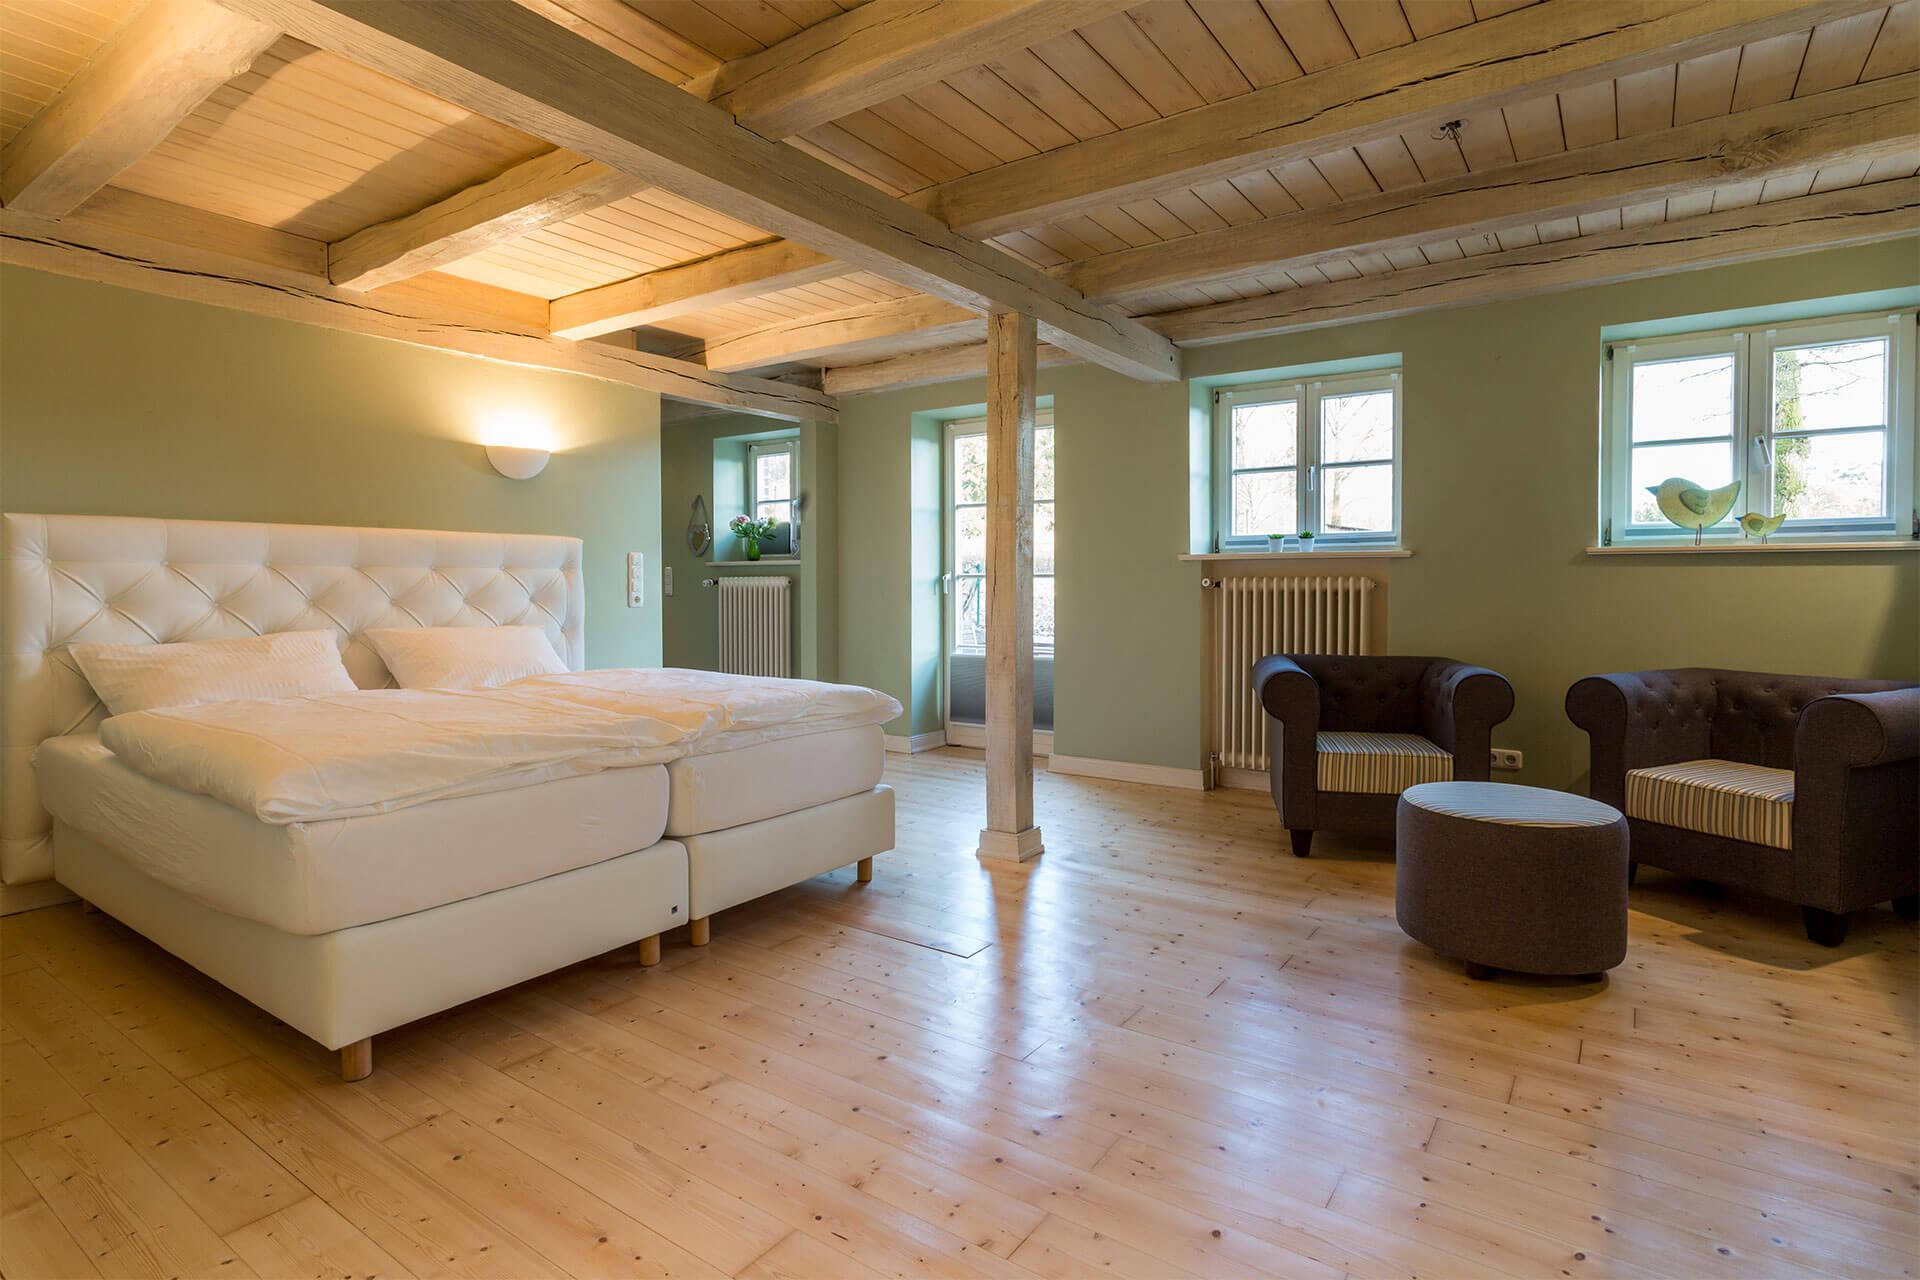 heinshof horseback riding vacation near hamburg. Black Bedroom Furniture Sets. Home Design Ideas